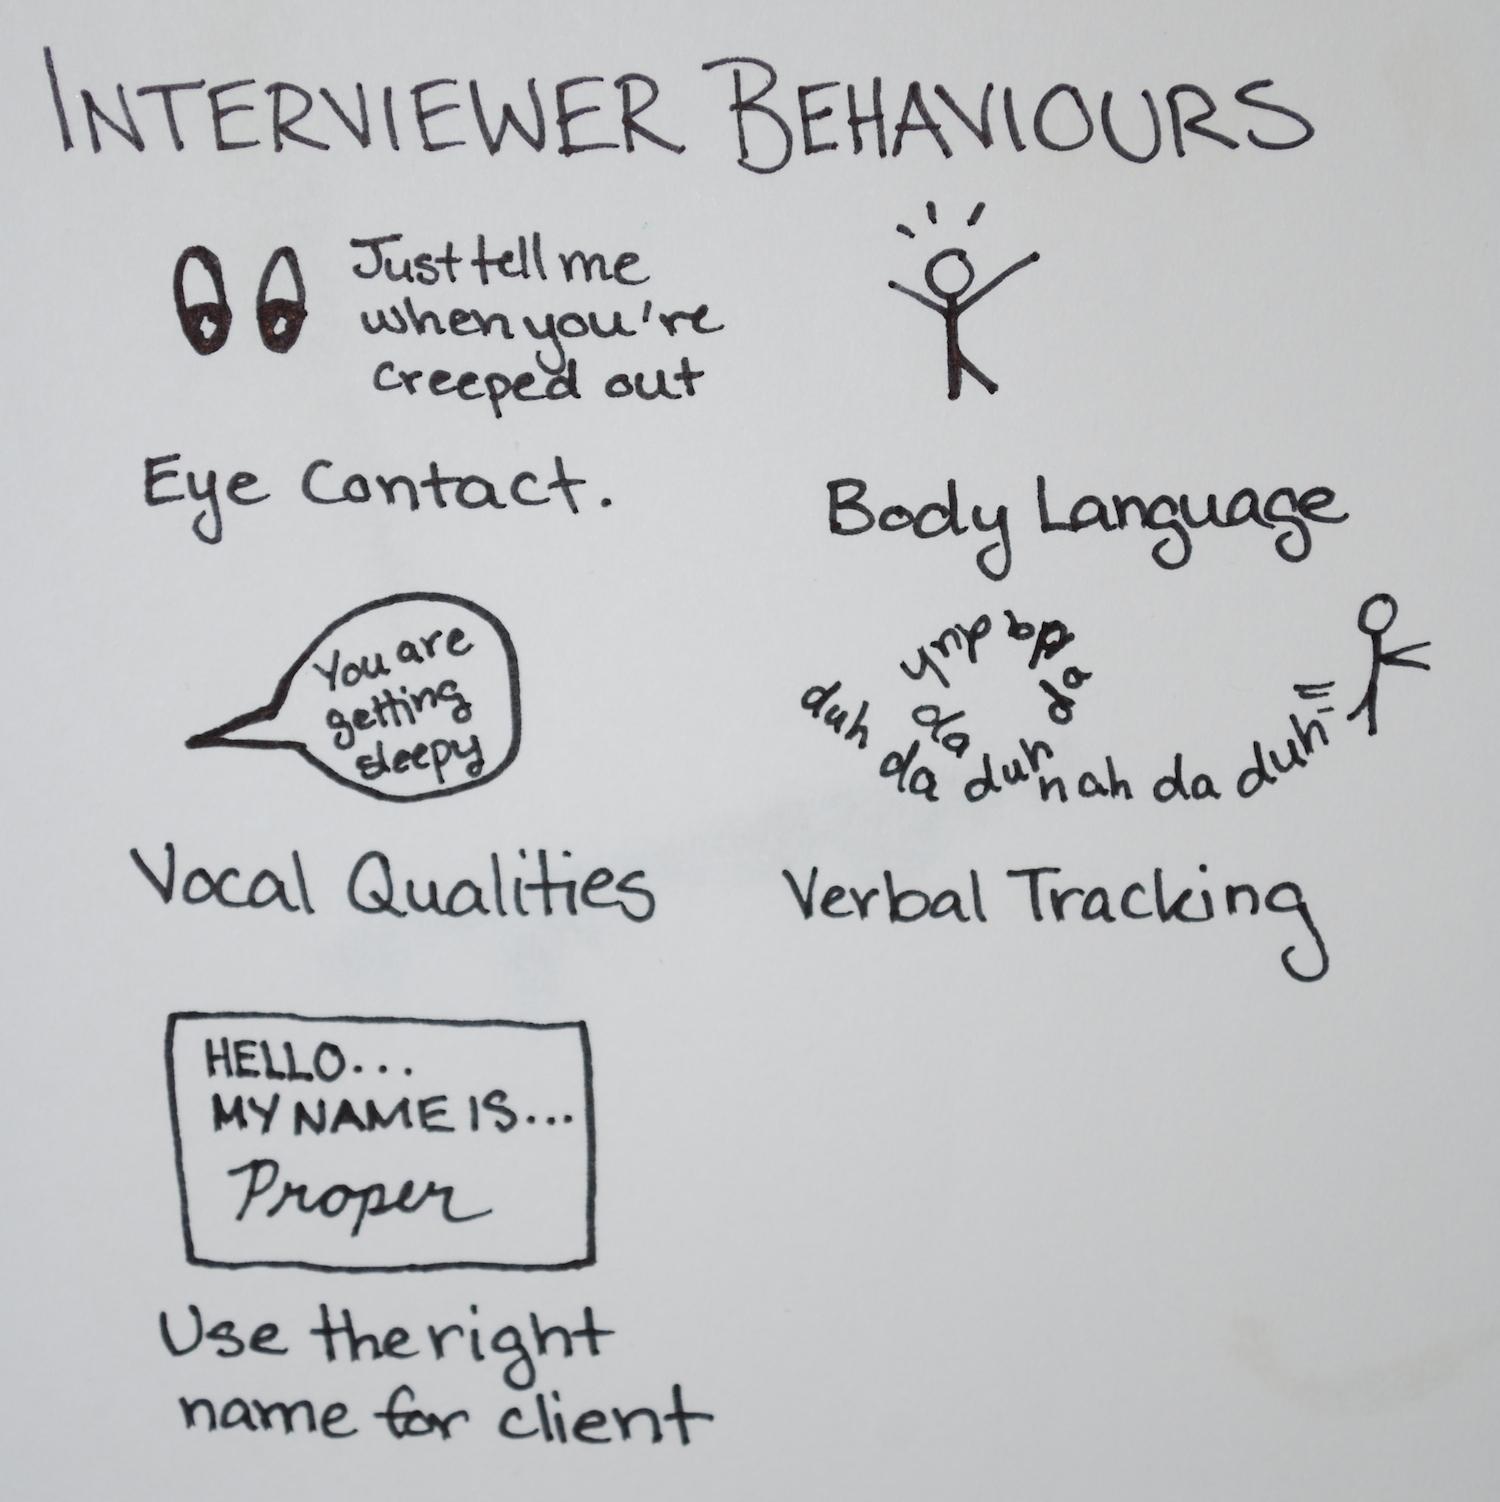 Interviewer Behaviours